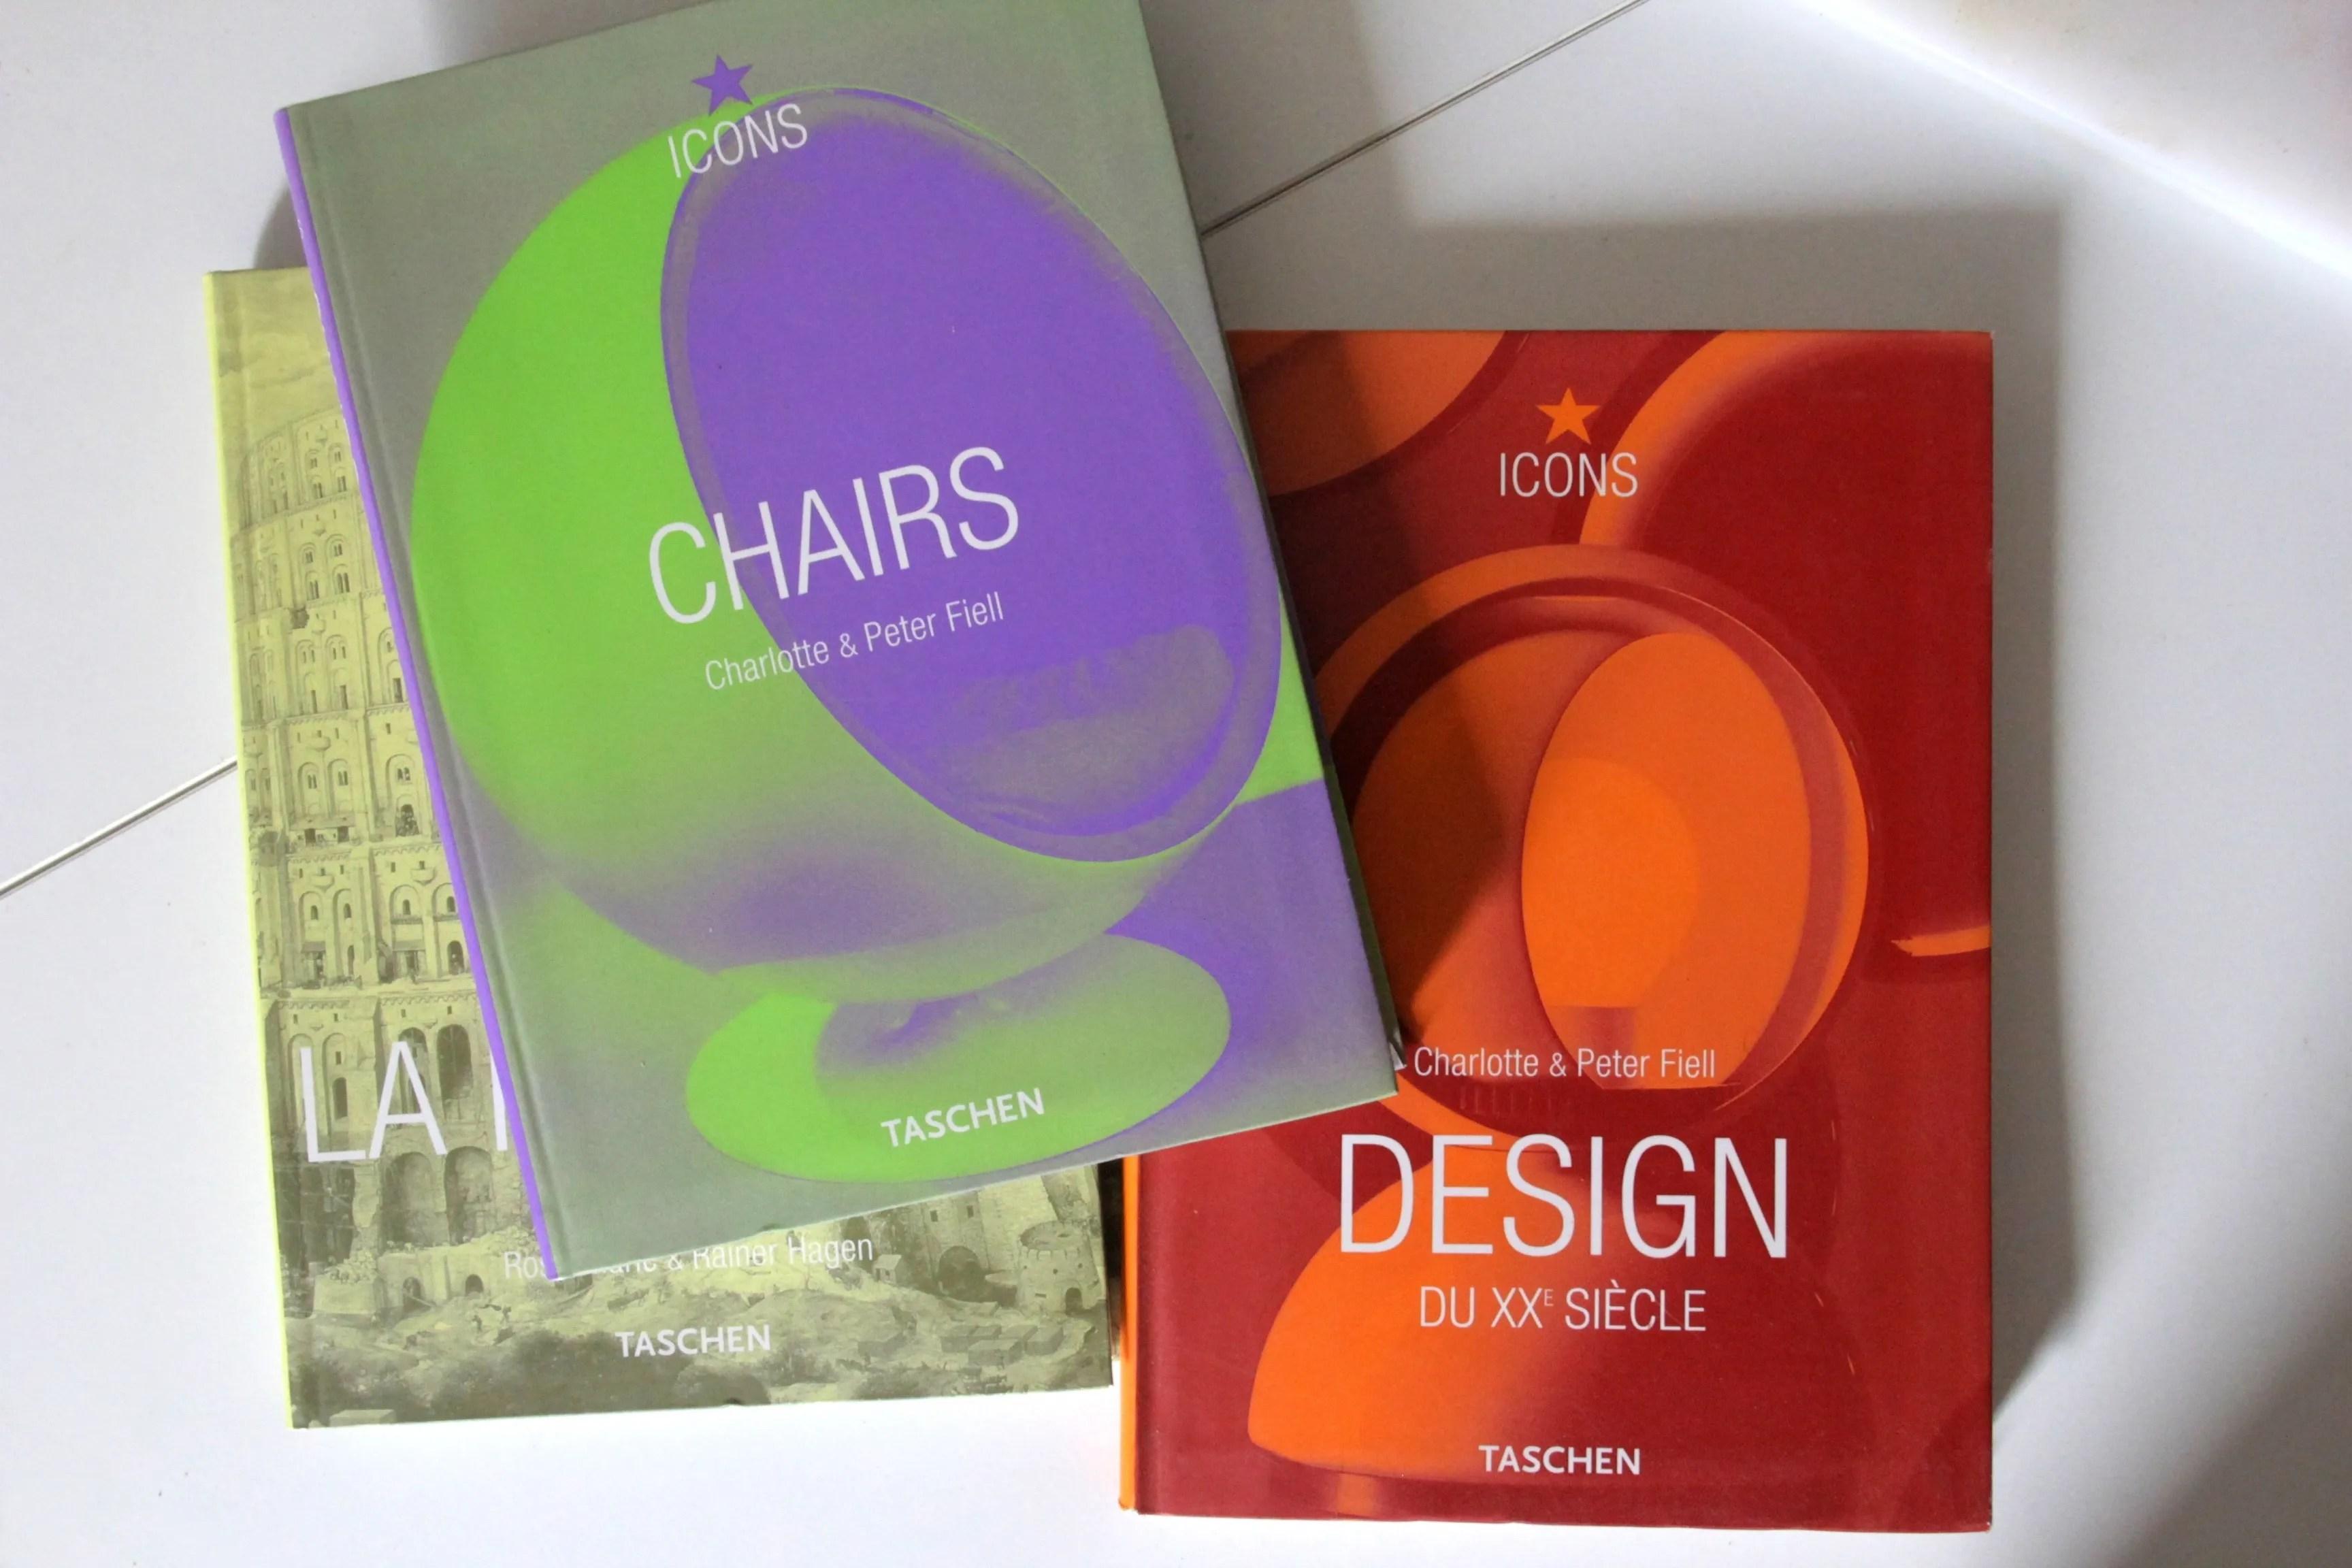 Taschen | Awesome design books